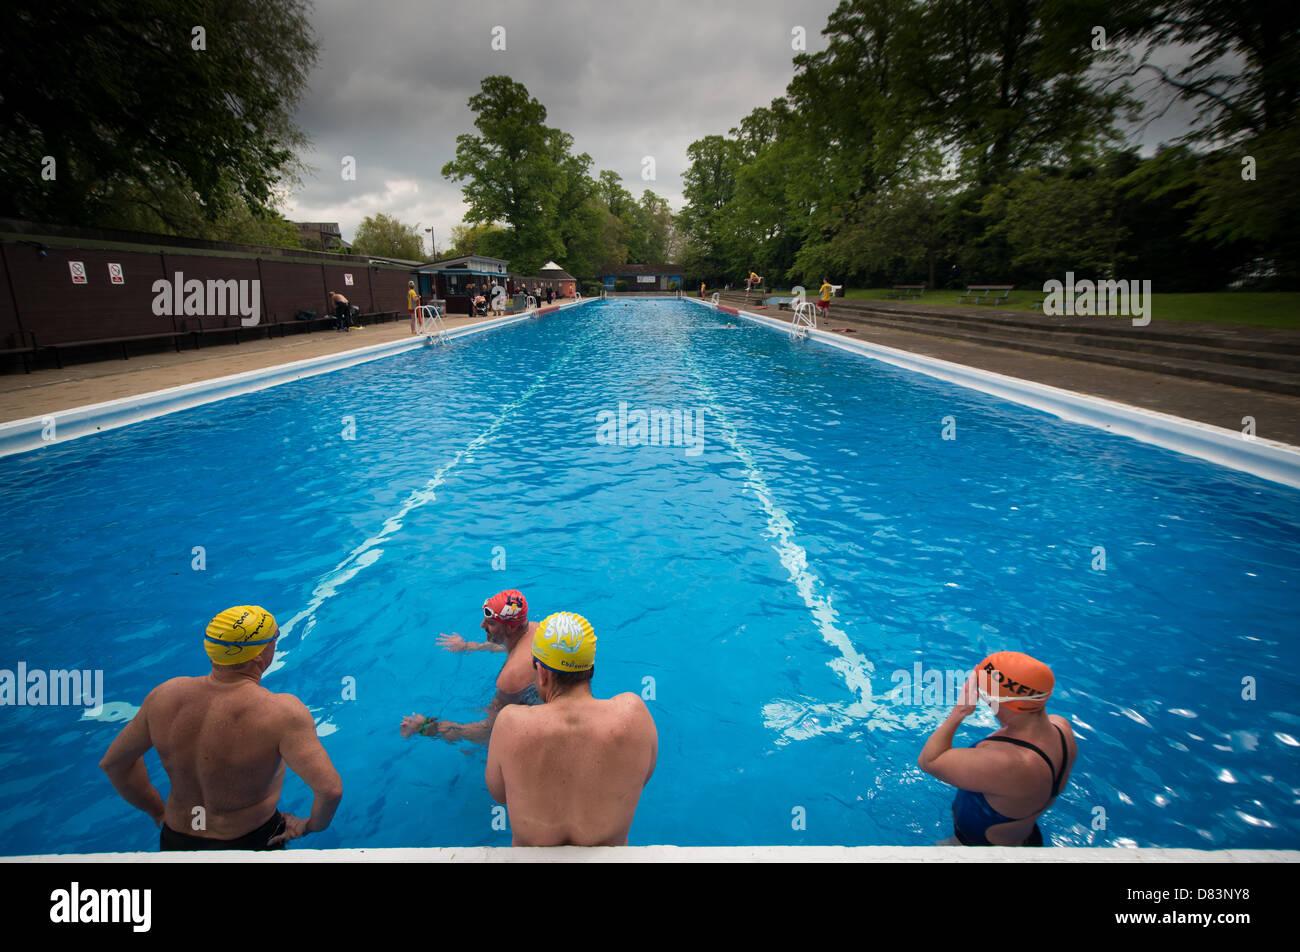 Lido Swimming Pool Stock Photos Lido Swimming Pool Stock Images Alamy